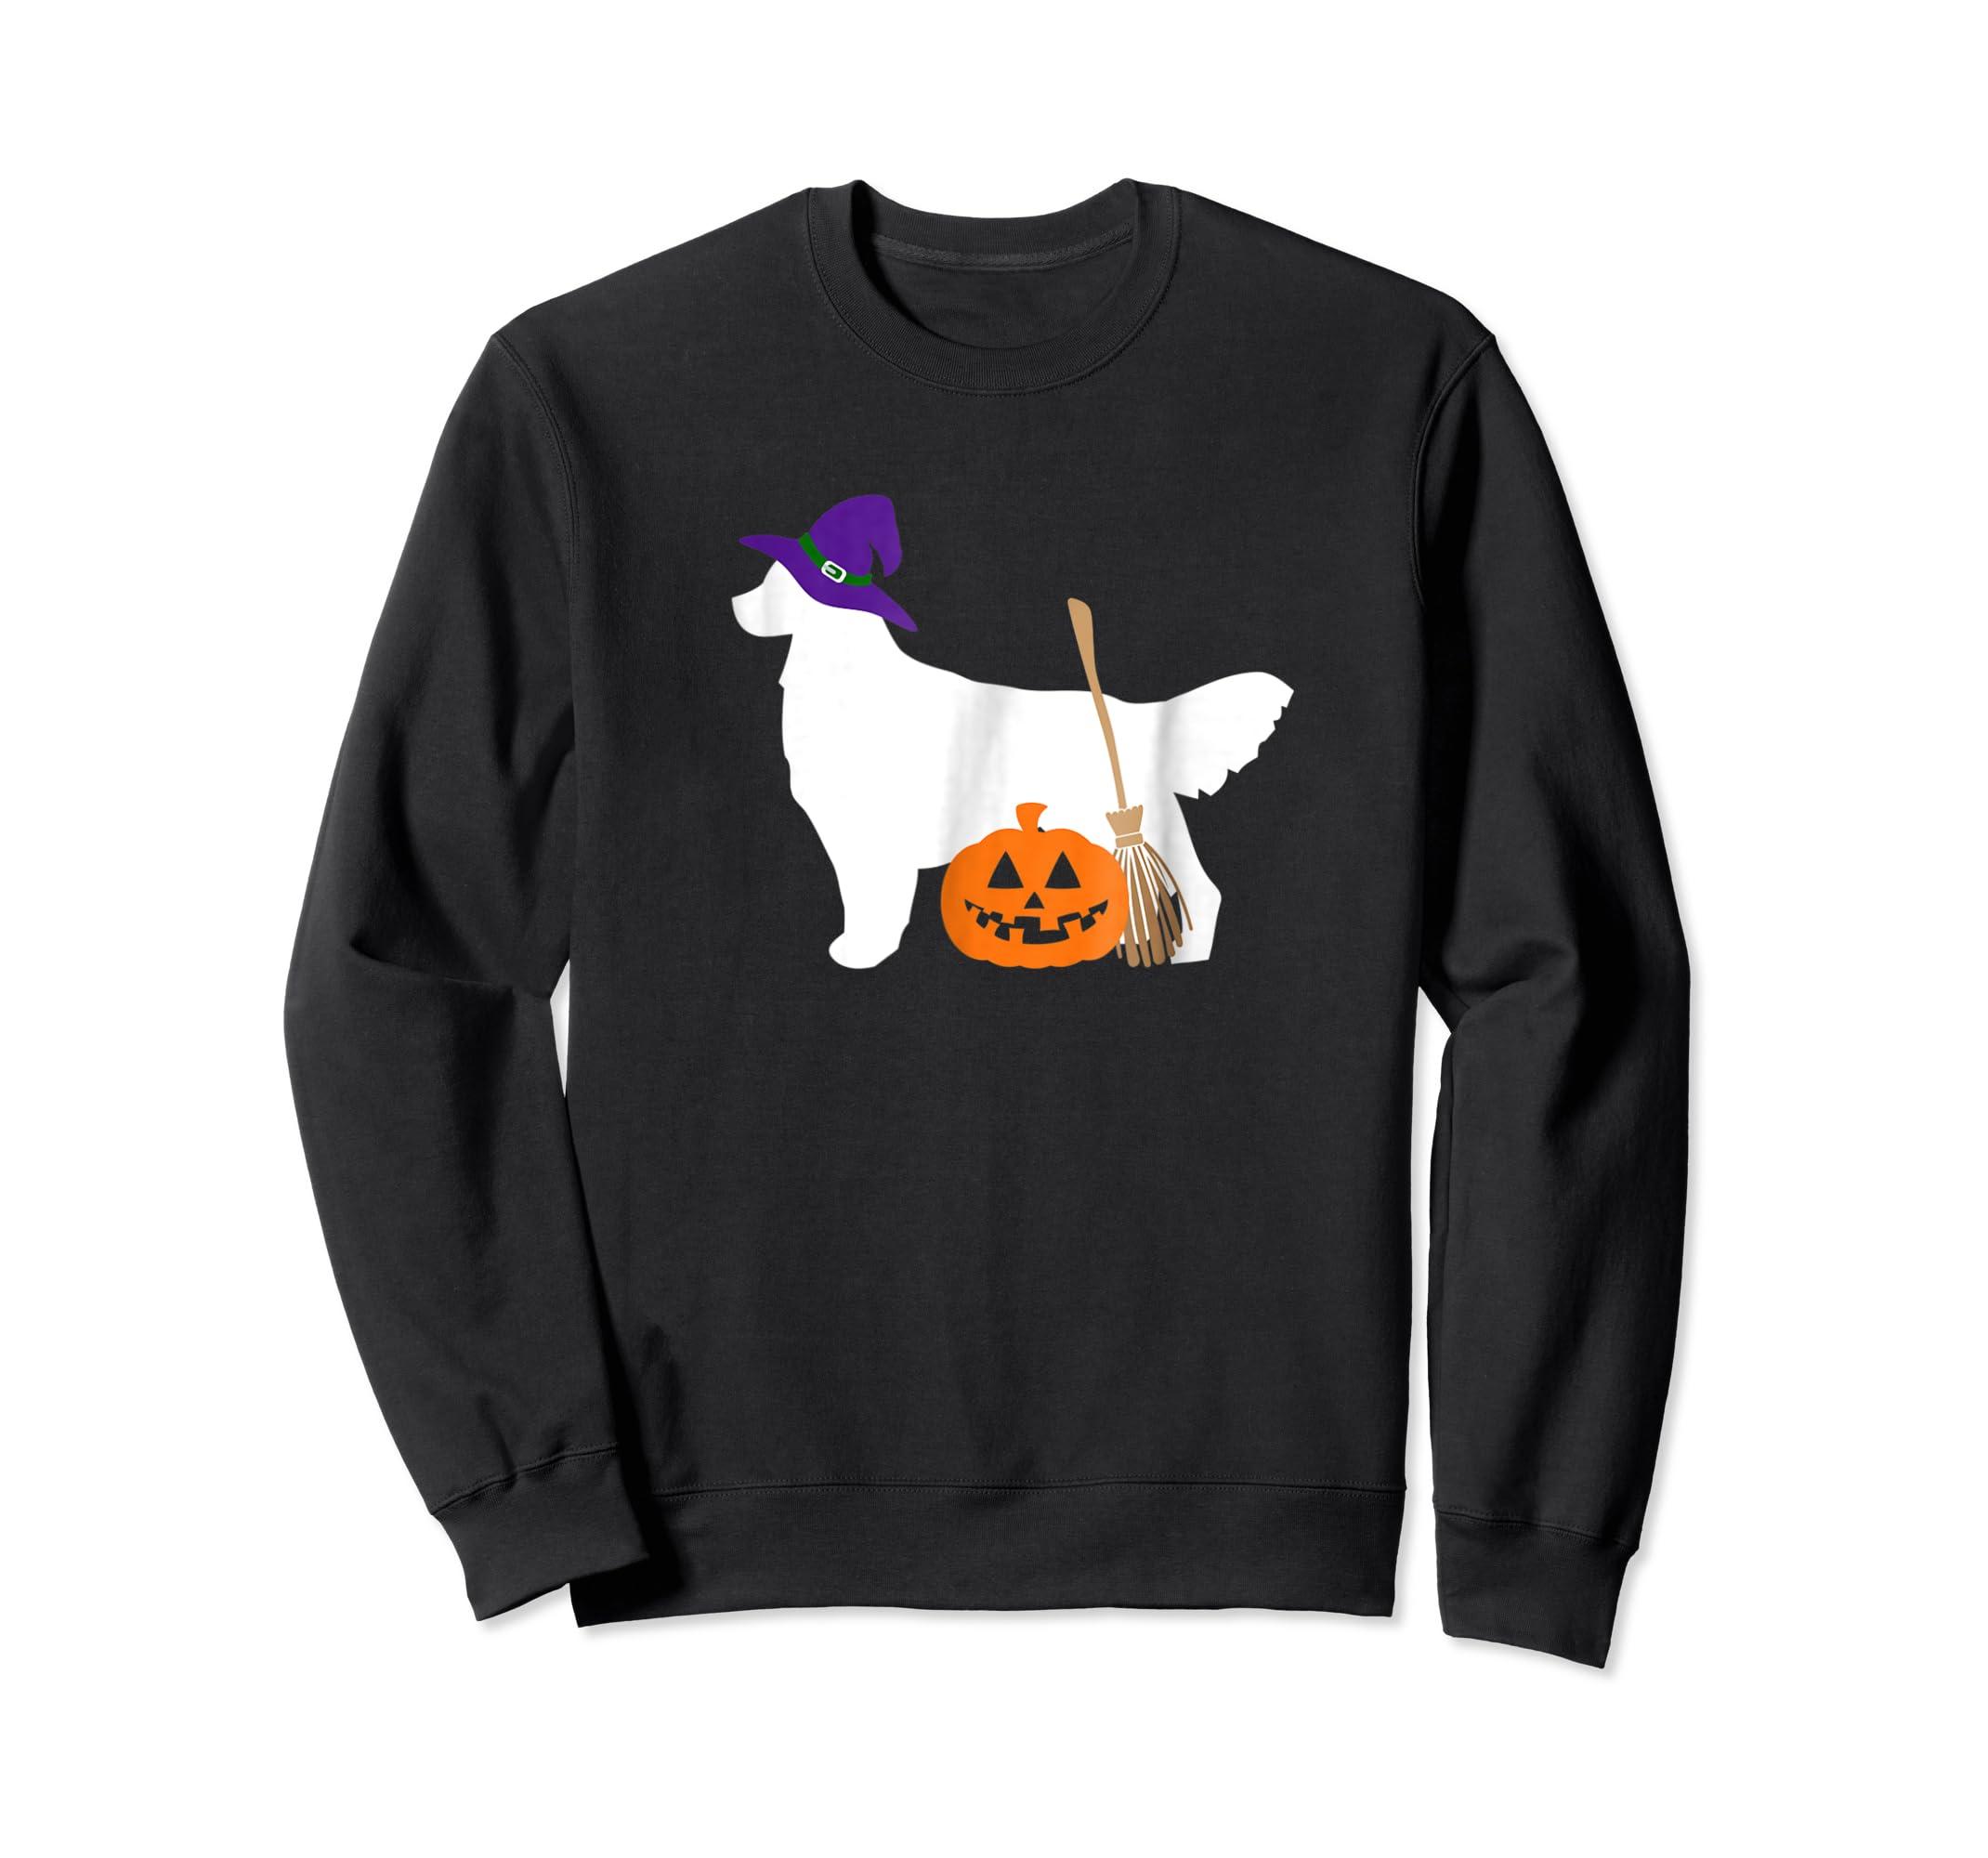 Golden Retriever Witch Hat Halloween Dog T-Shirt-Sweatshirt-Black